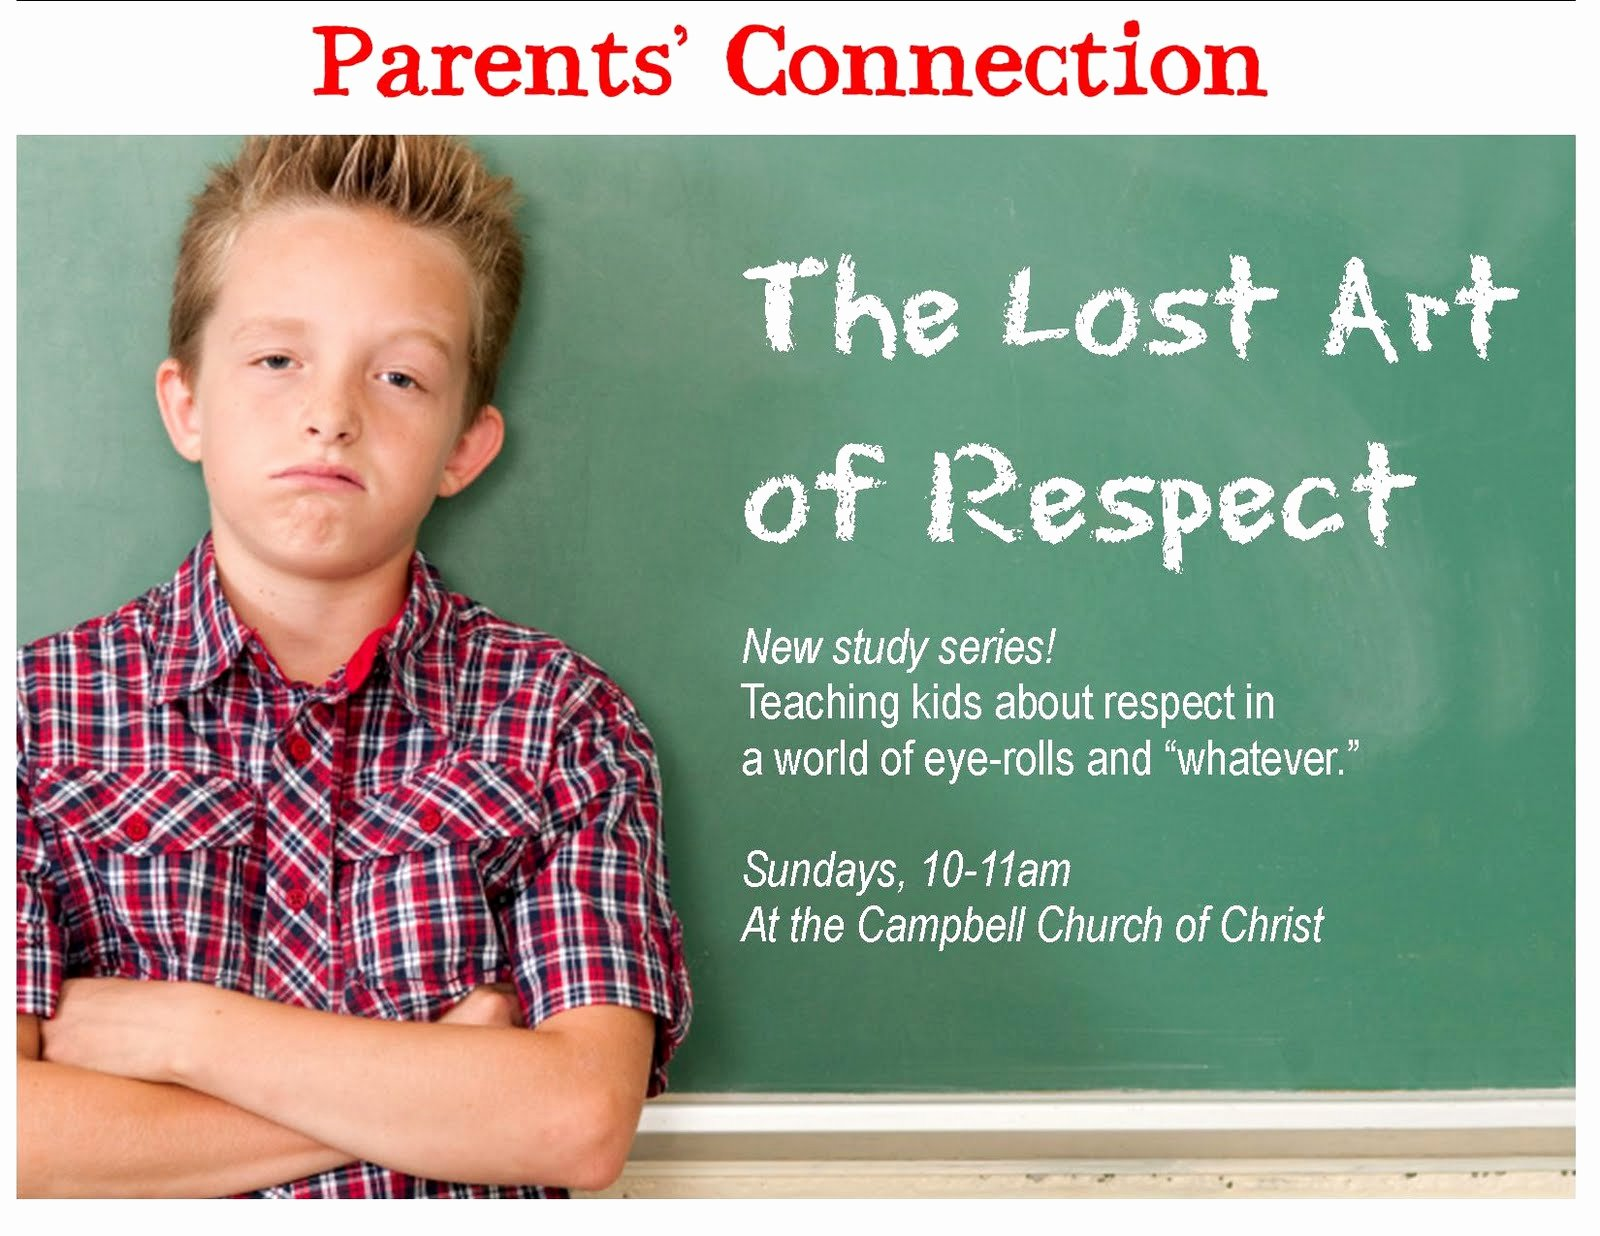 Respecting Others Property Essay Unique Respect Parents Quotes Quotesgram